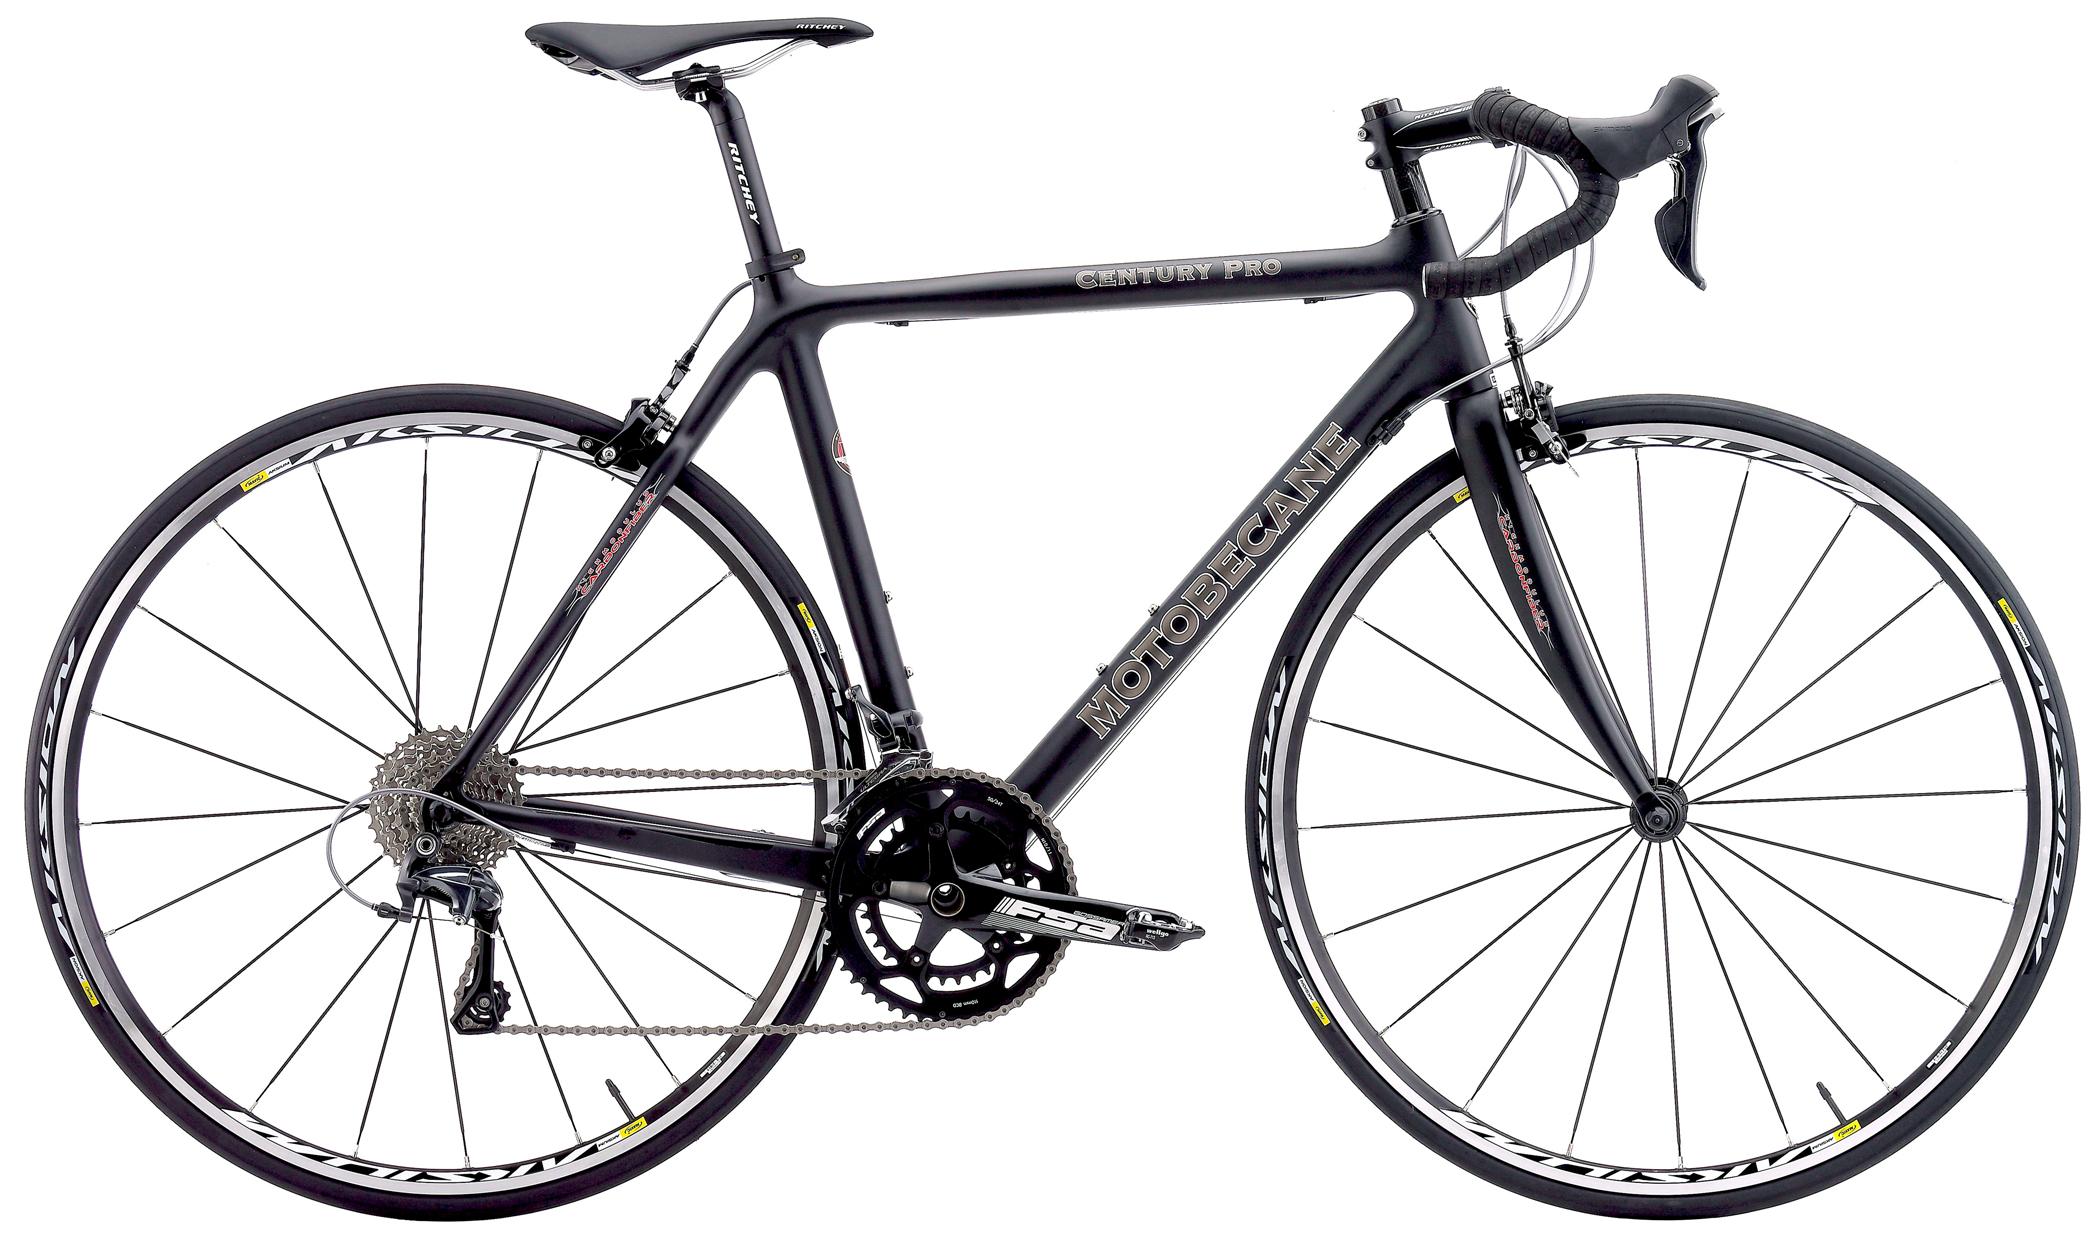 Save Up To 60 Off Shimano Ultegra Carbon Fiber Road Bikes Roadbikes